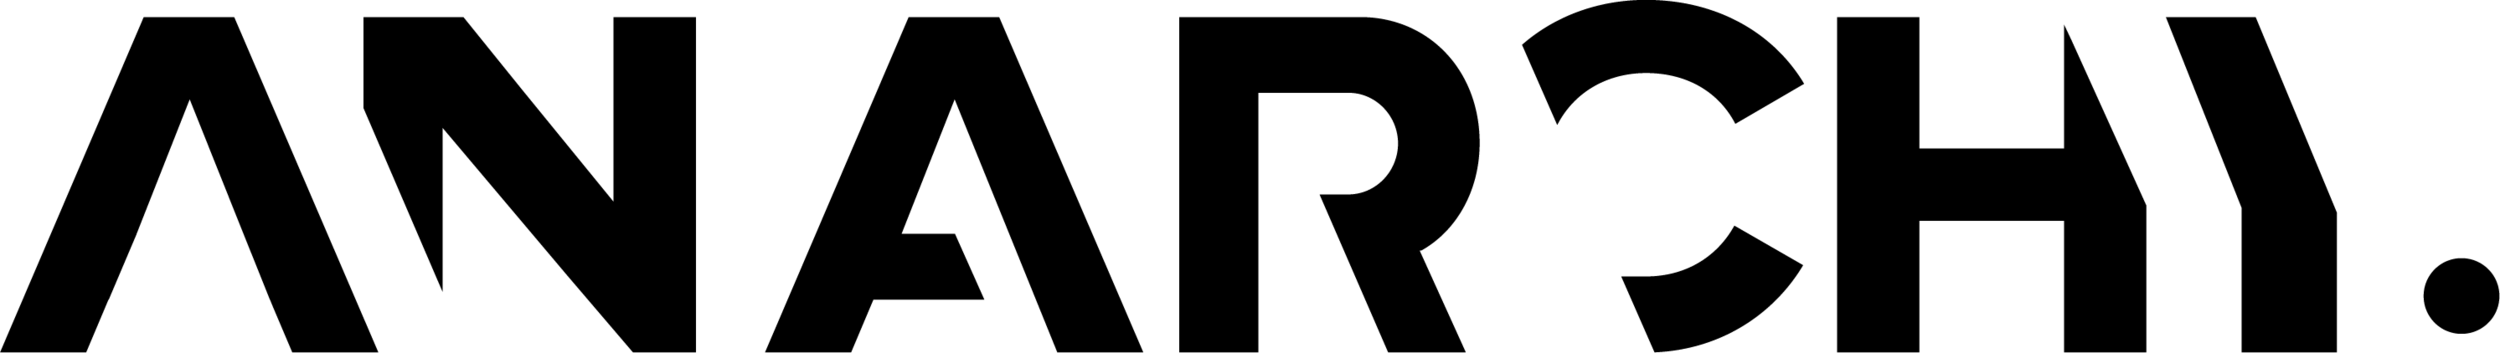 Anarchy™  The Label logo